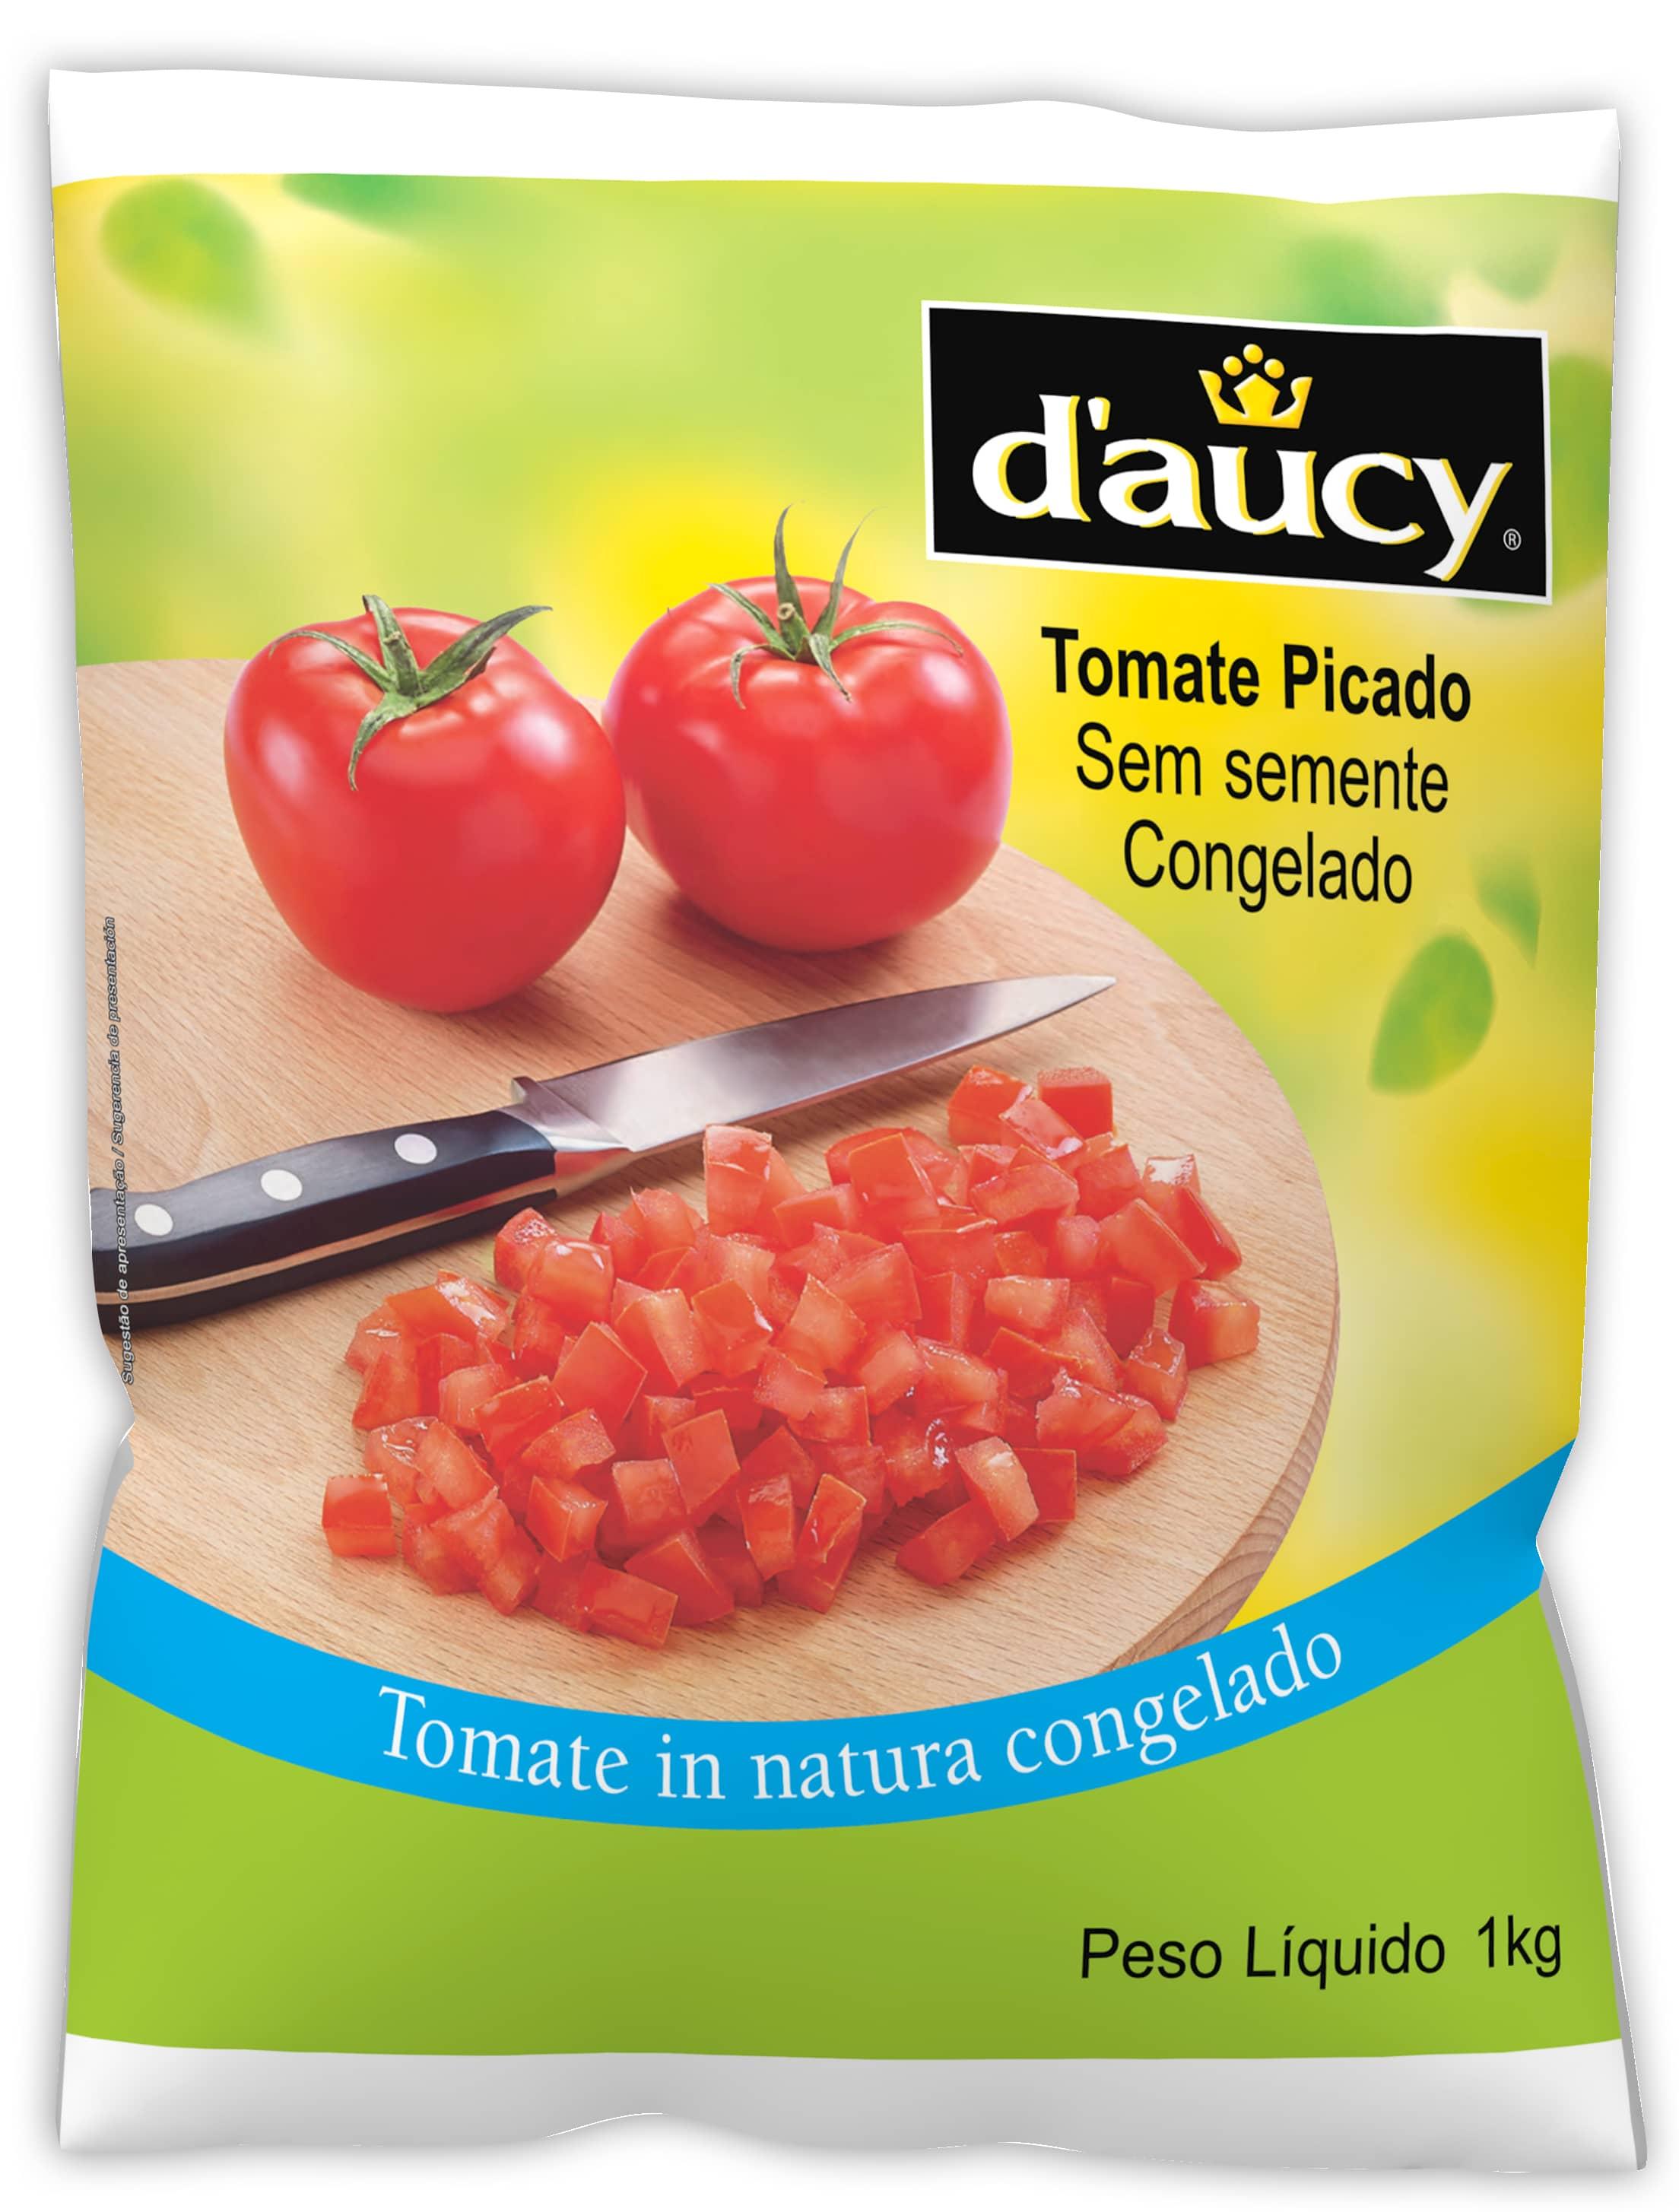 daucy-pacote-tomate-1kg-mockup